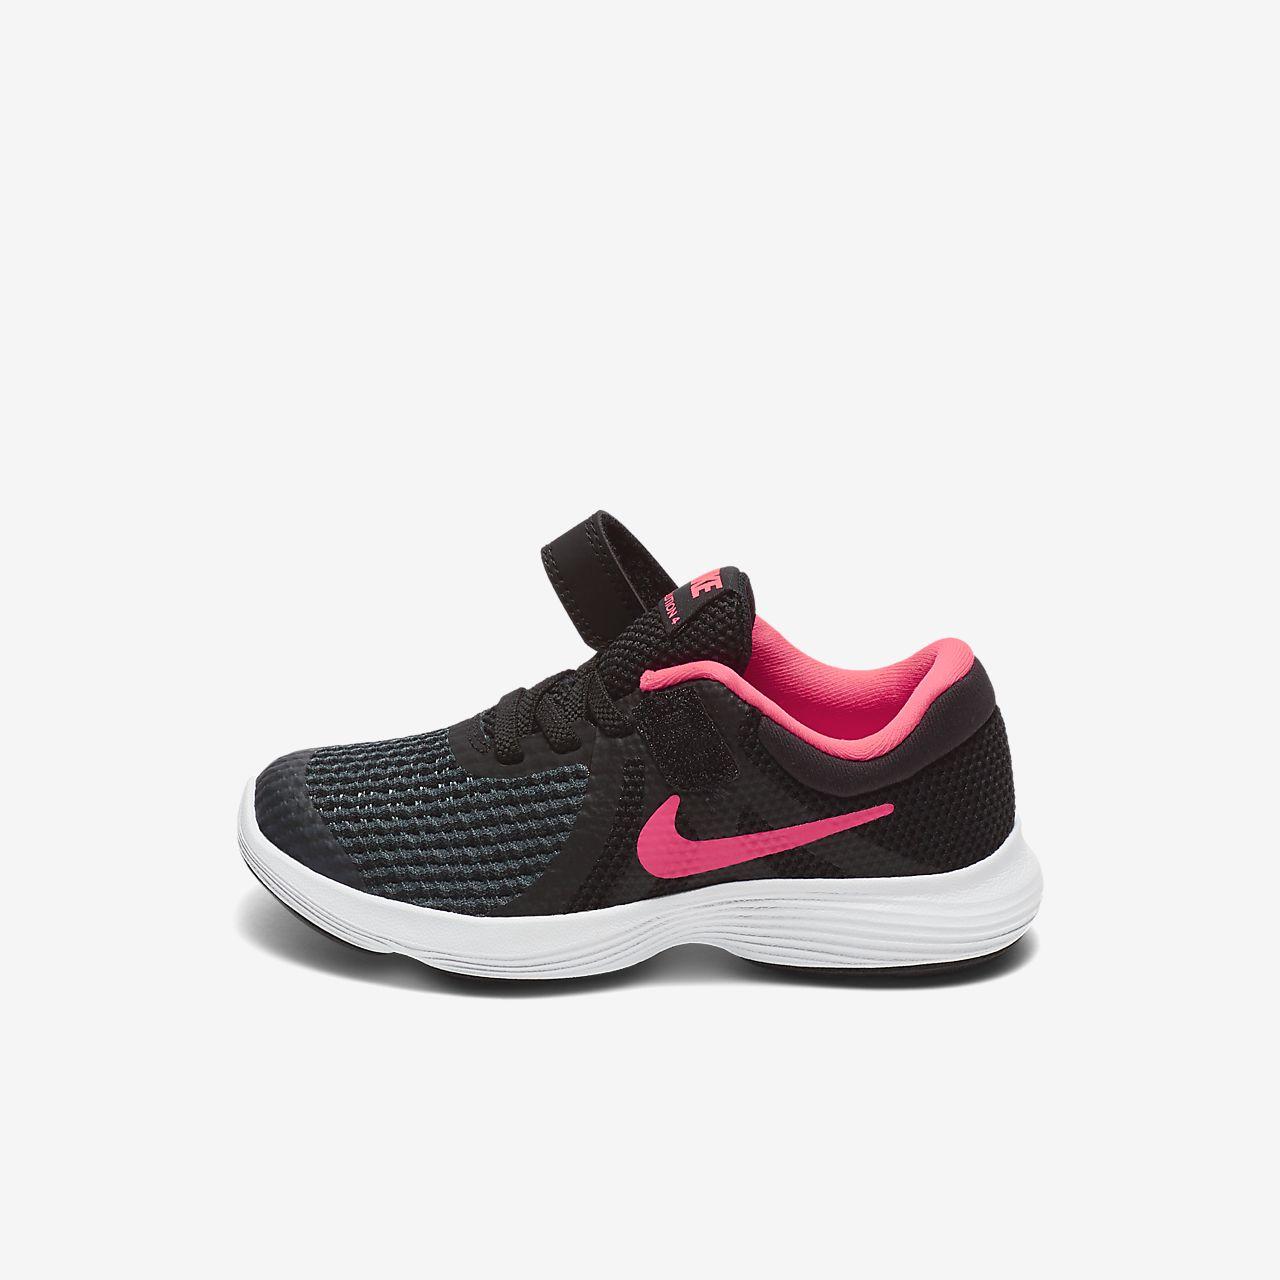 27e5f8bc453 Nike Revolution 4 Younger Kids  Shoe. Nike.com AU